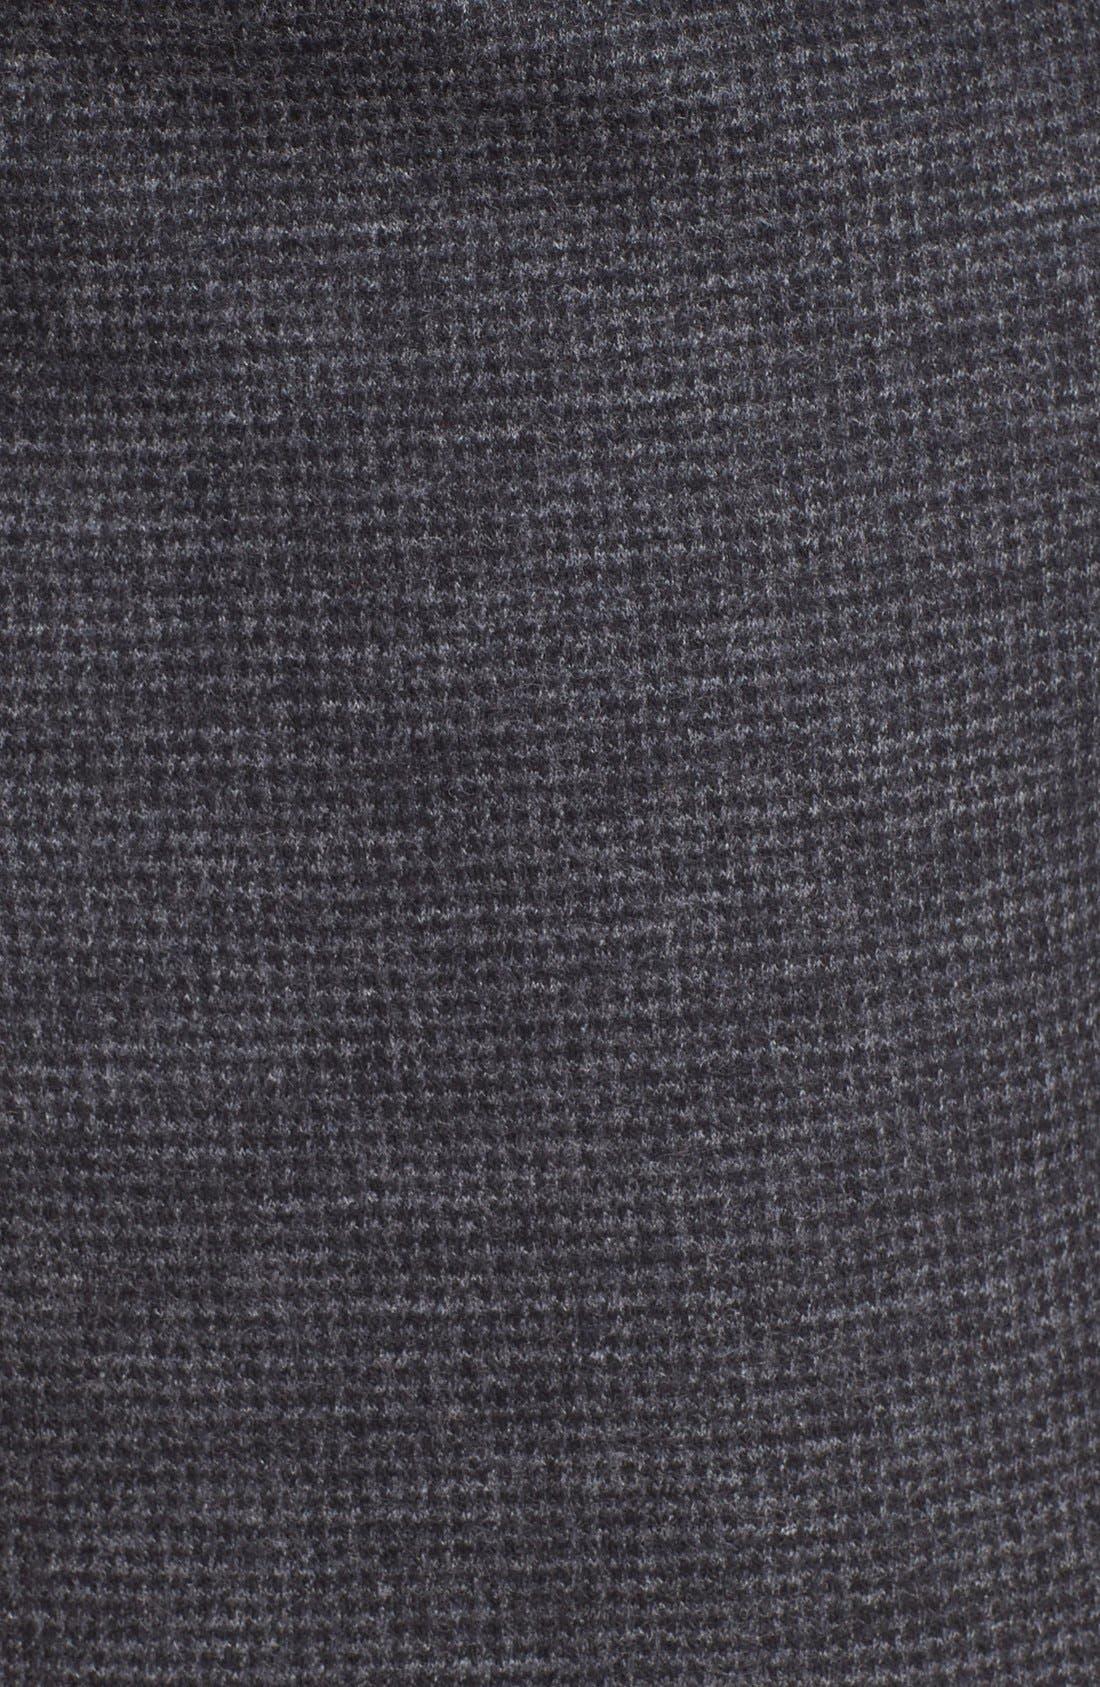 LANVIN, Microcheck Moto Pants, Alternate thumbnail 5, color, 020